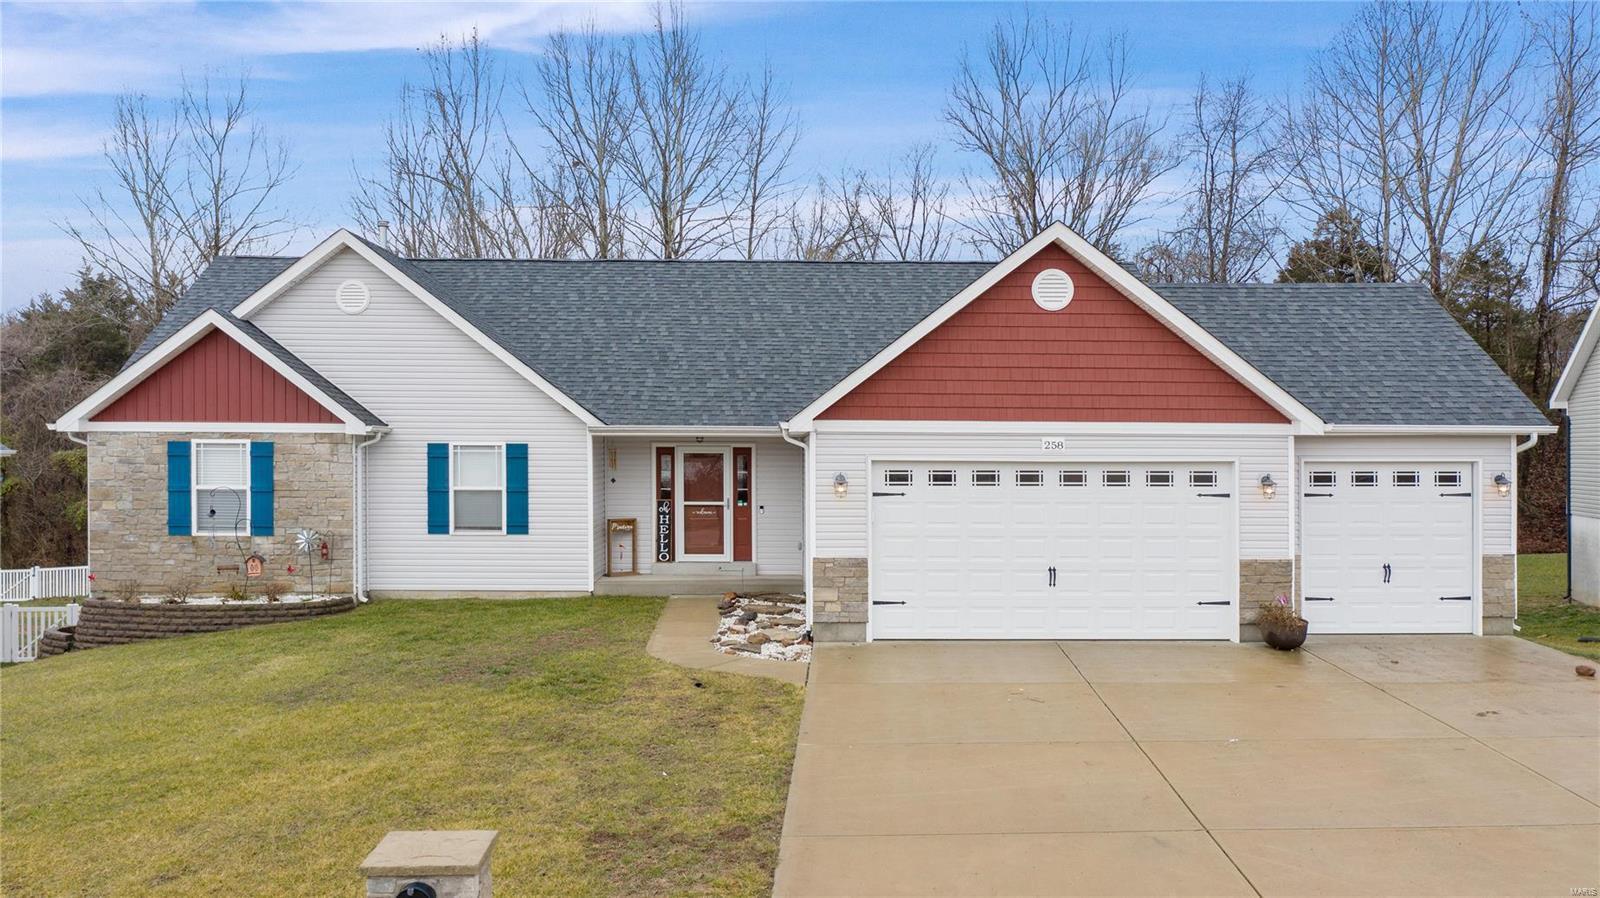 258 Longleaf Pine Drive Property Photo - Festus, MO real estate listing